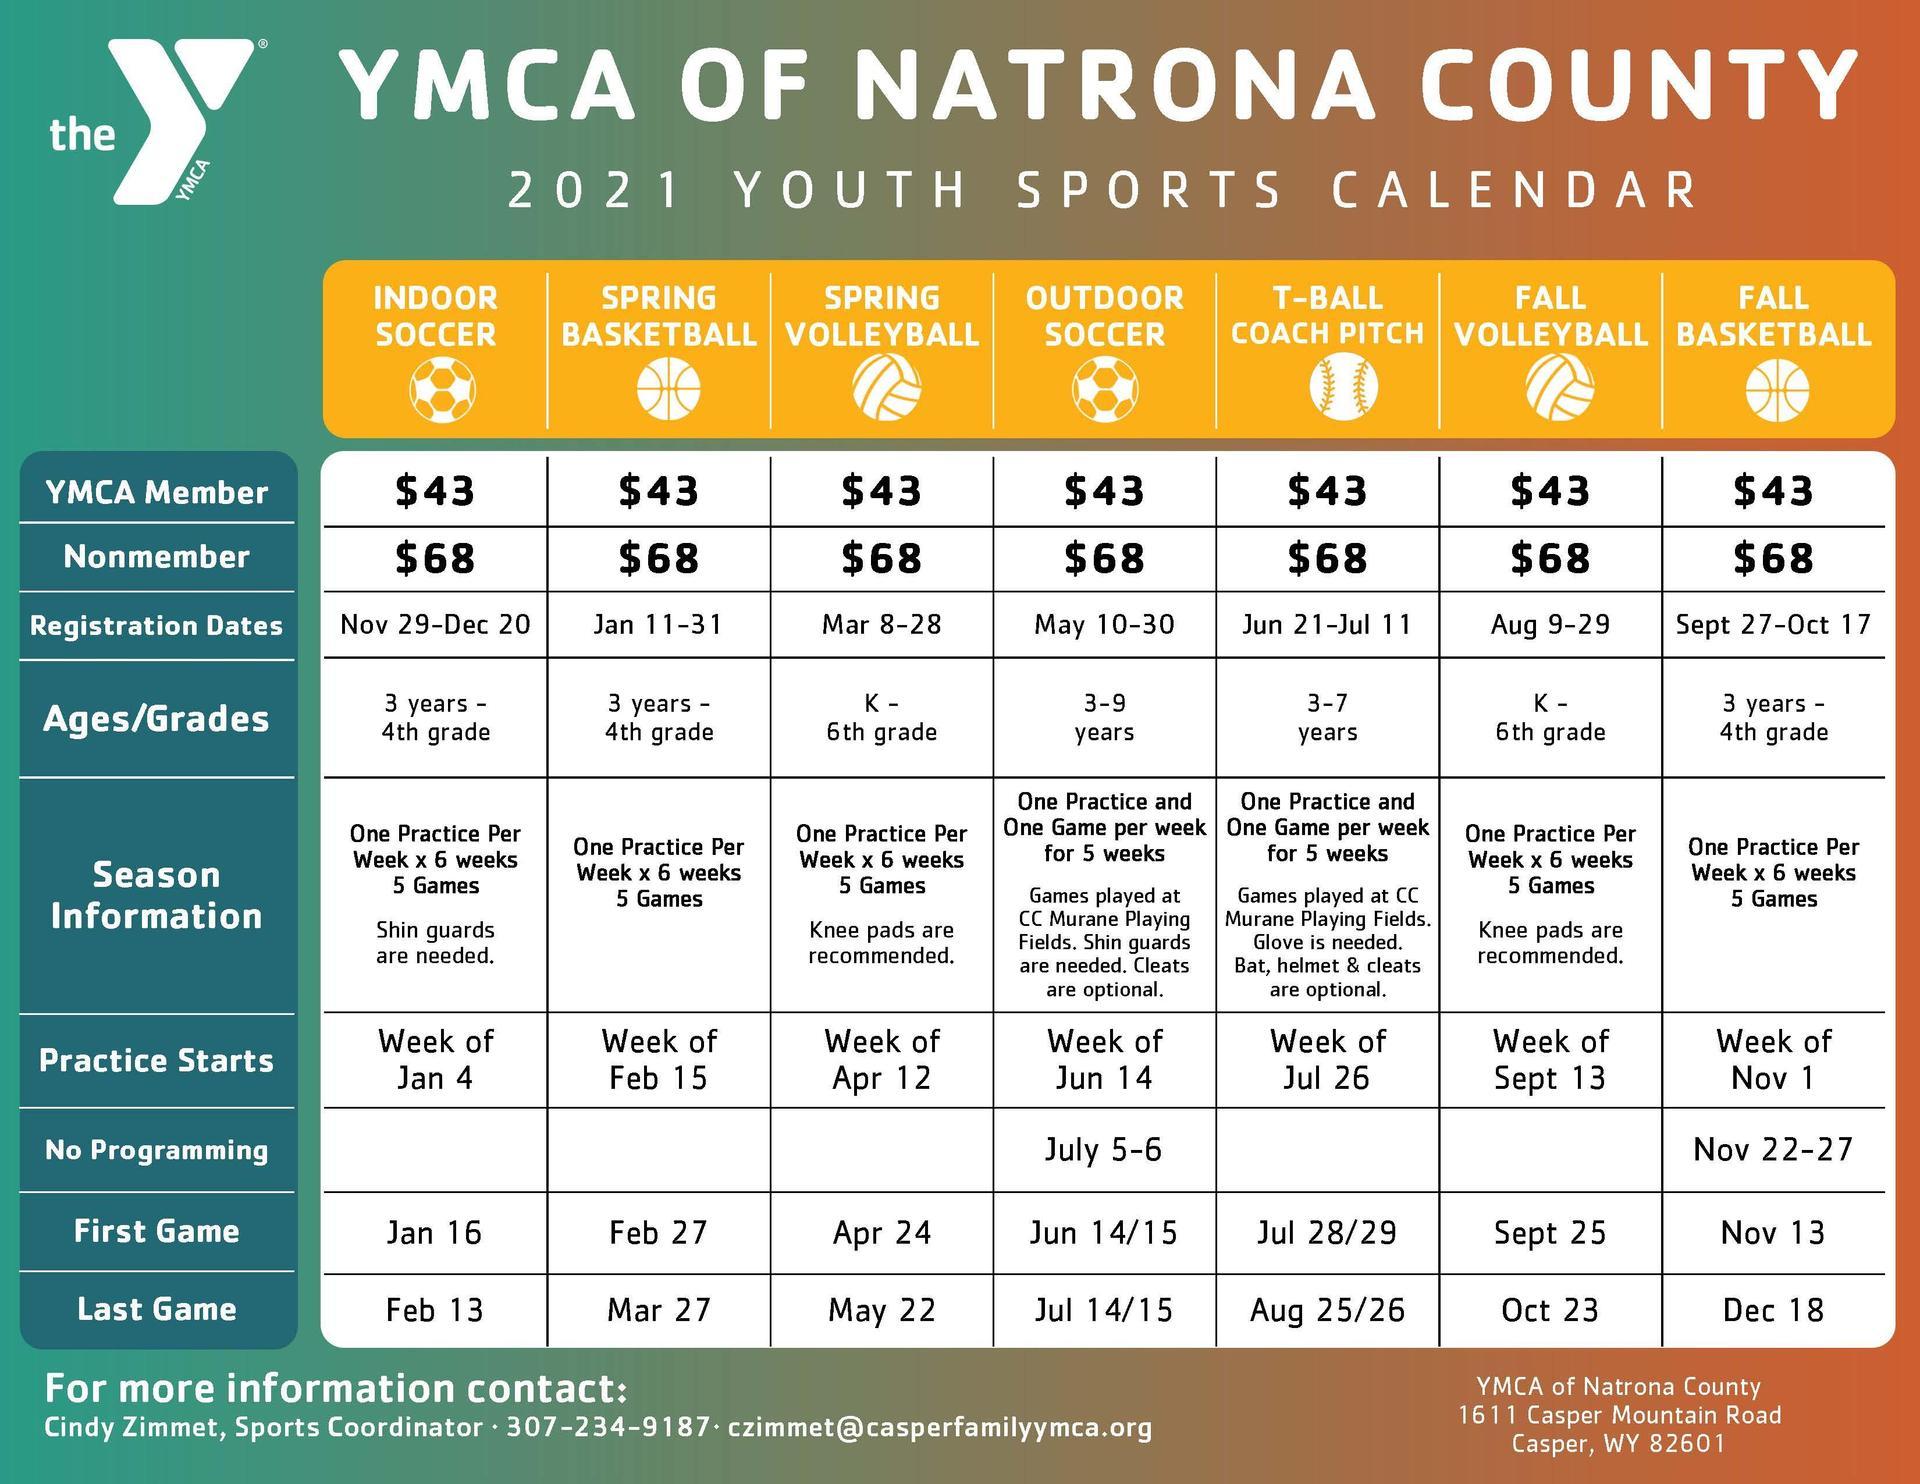 YMCA Sports Calendar